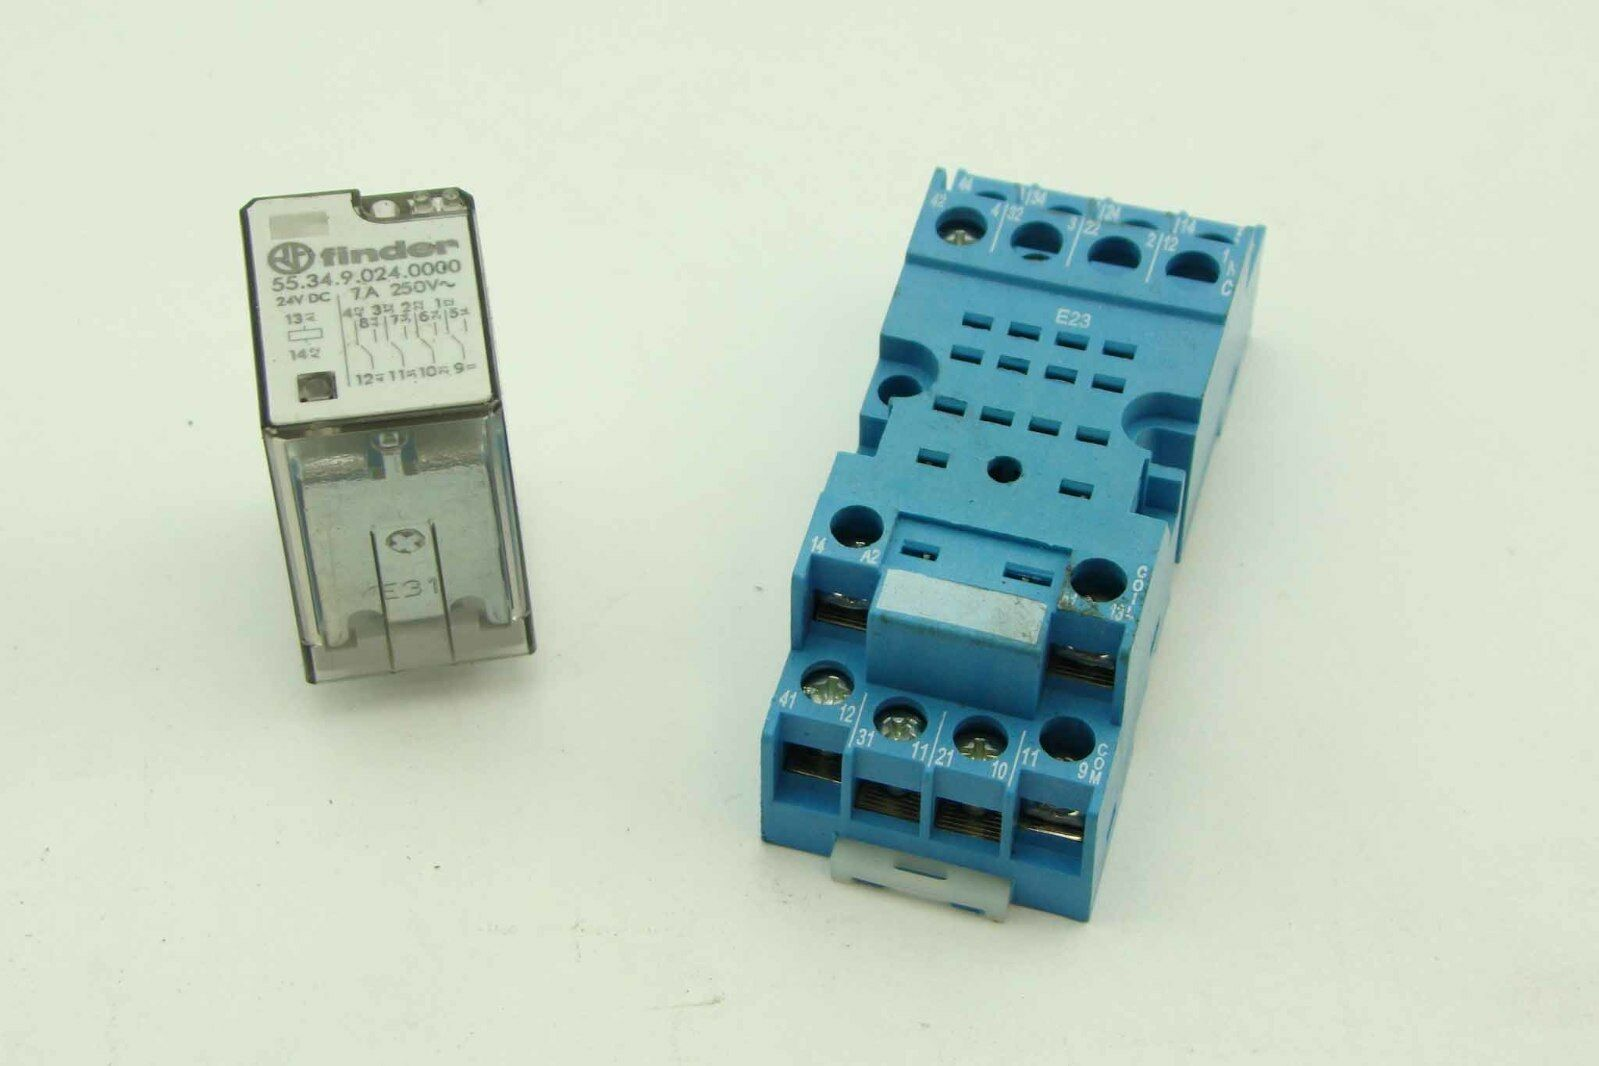 Finder 55 34 Power Relay 24v Dc  7a  250v  U0026 Relay Base 94